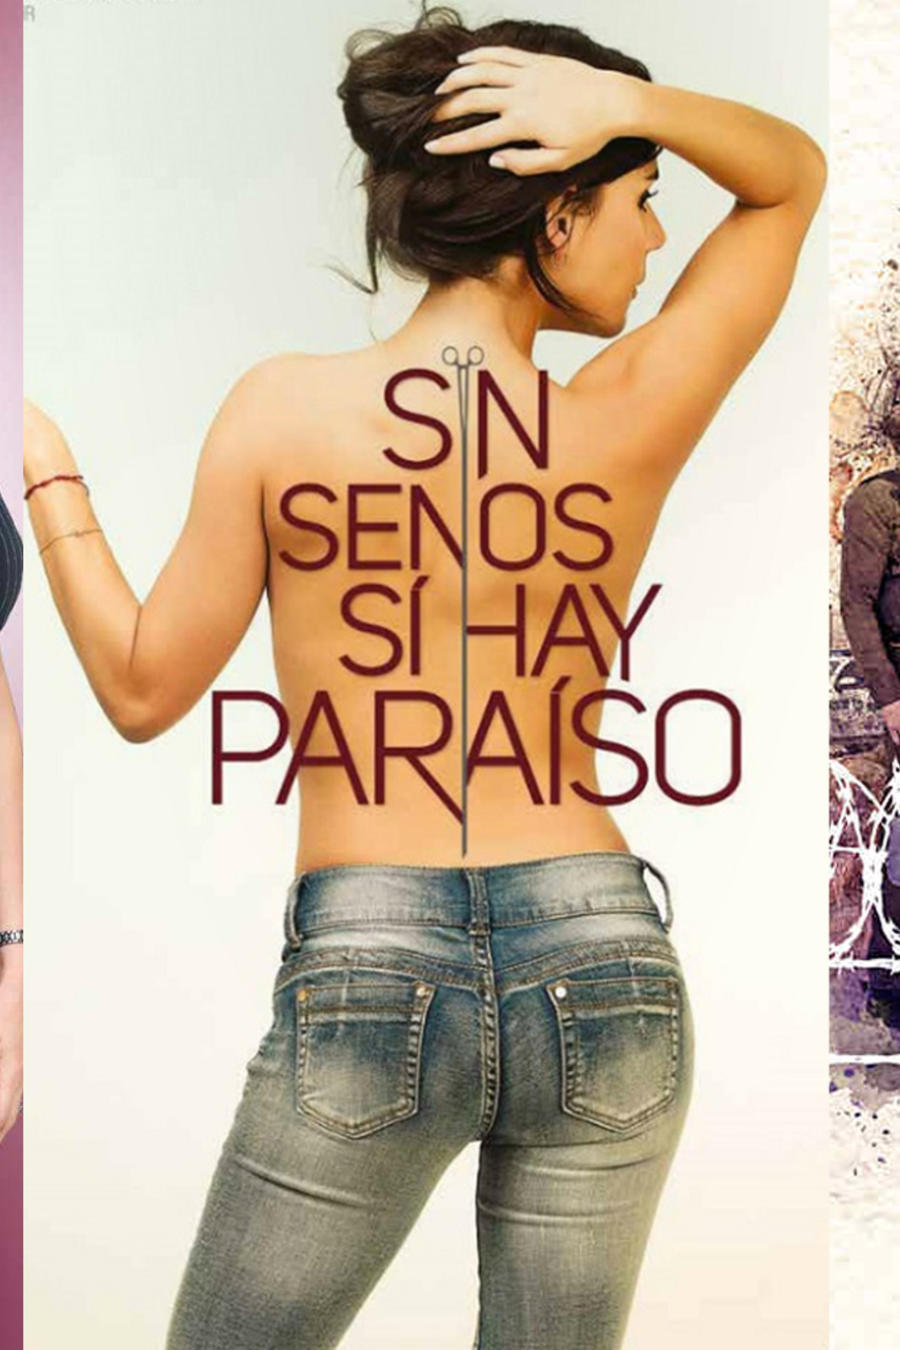 Poster, Silvana sin lana, Sin senos sí hay Paraíso, Señora Acero